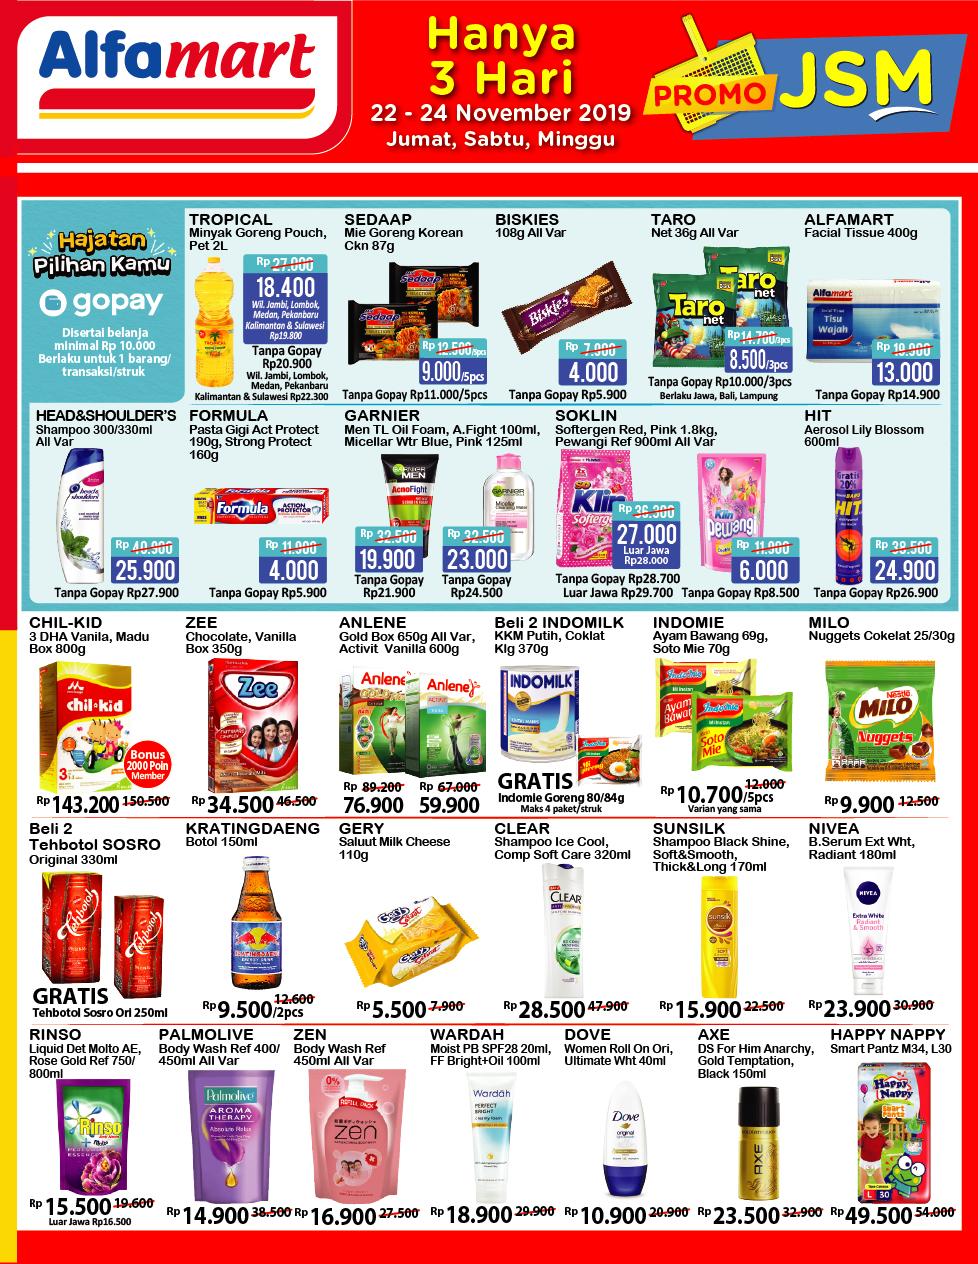 Katalog Promo Jsm Alfamart Periode 22 24 November 2019